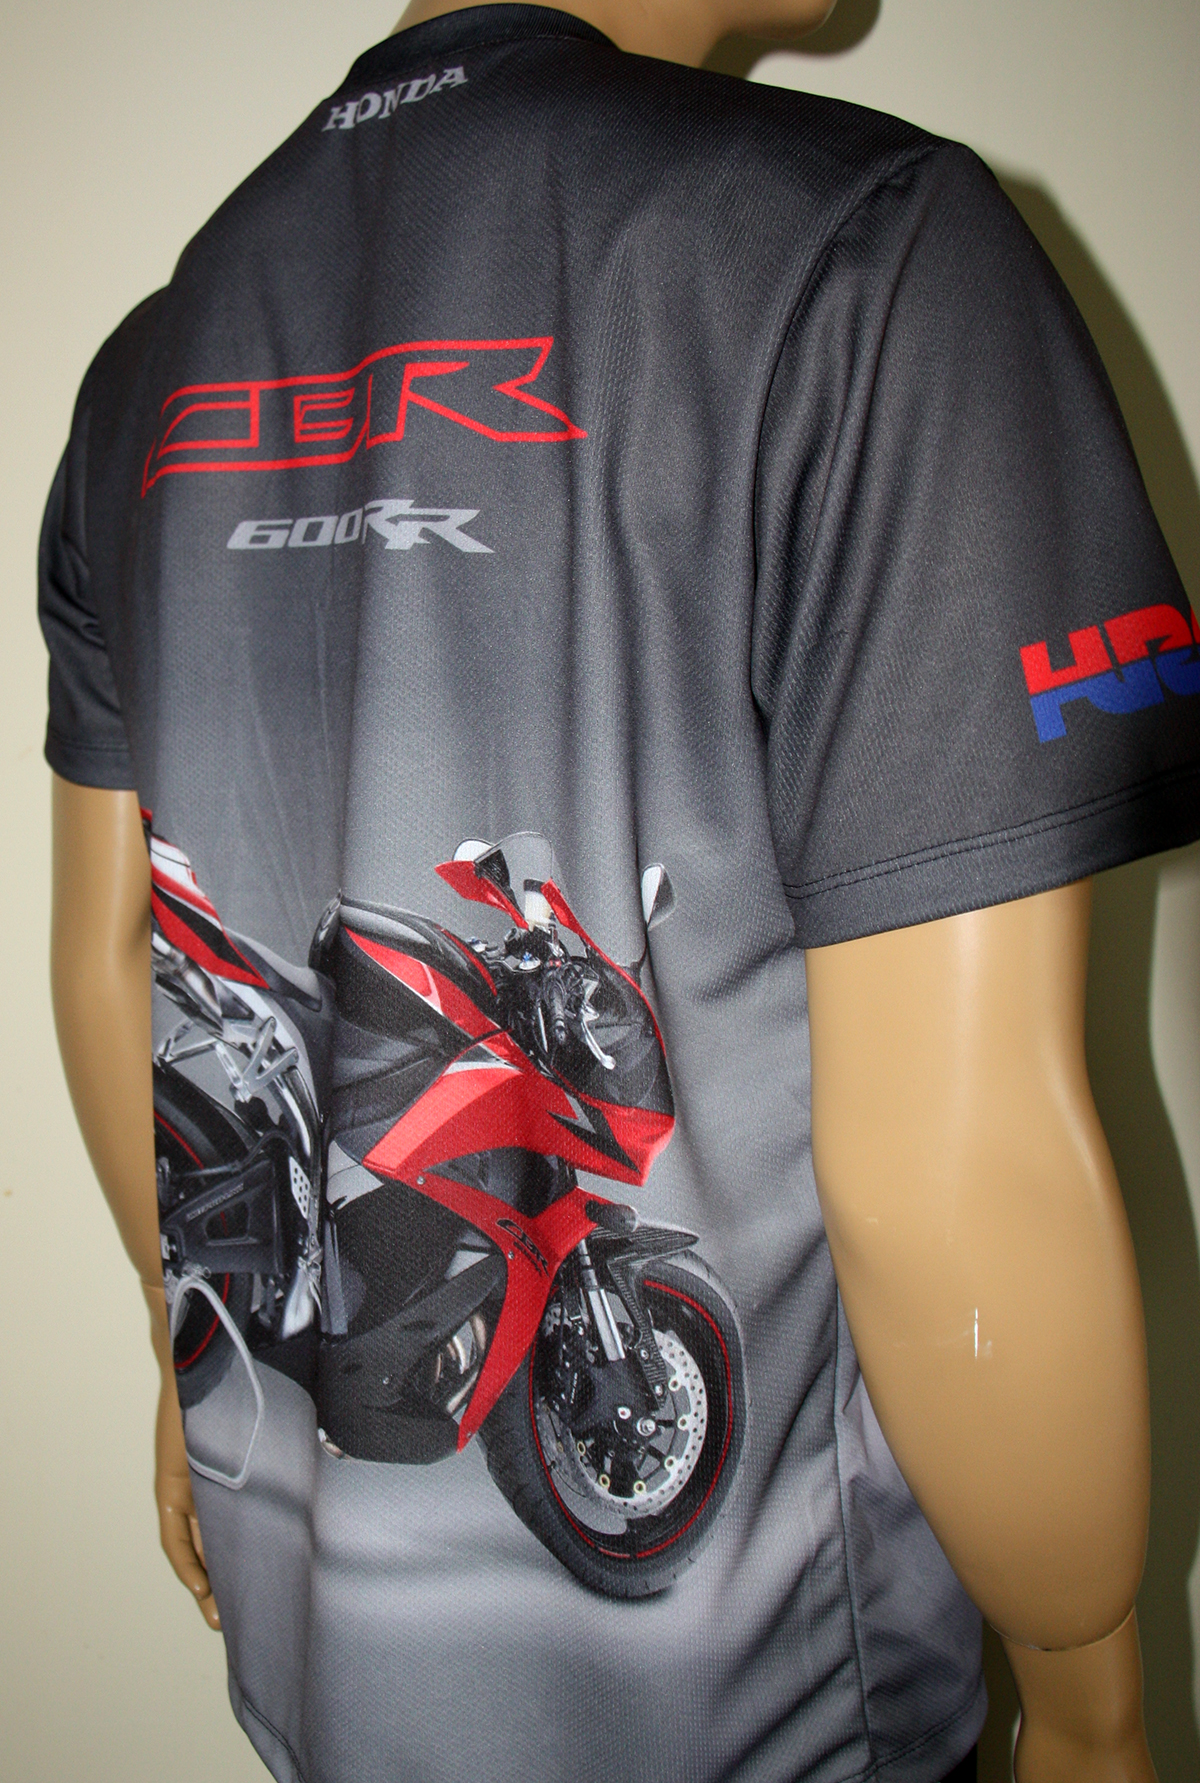 honda cbr 600 rr hrc 2010 t shirt motorsport racing